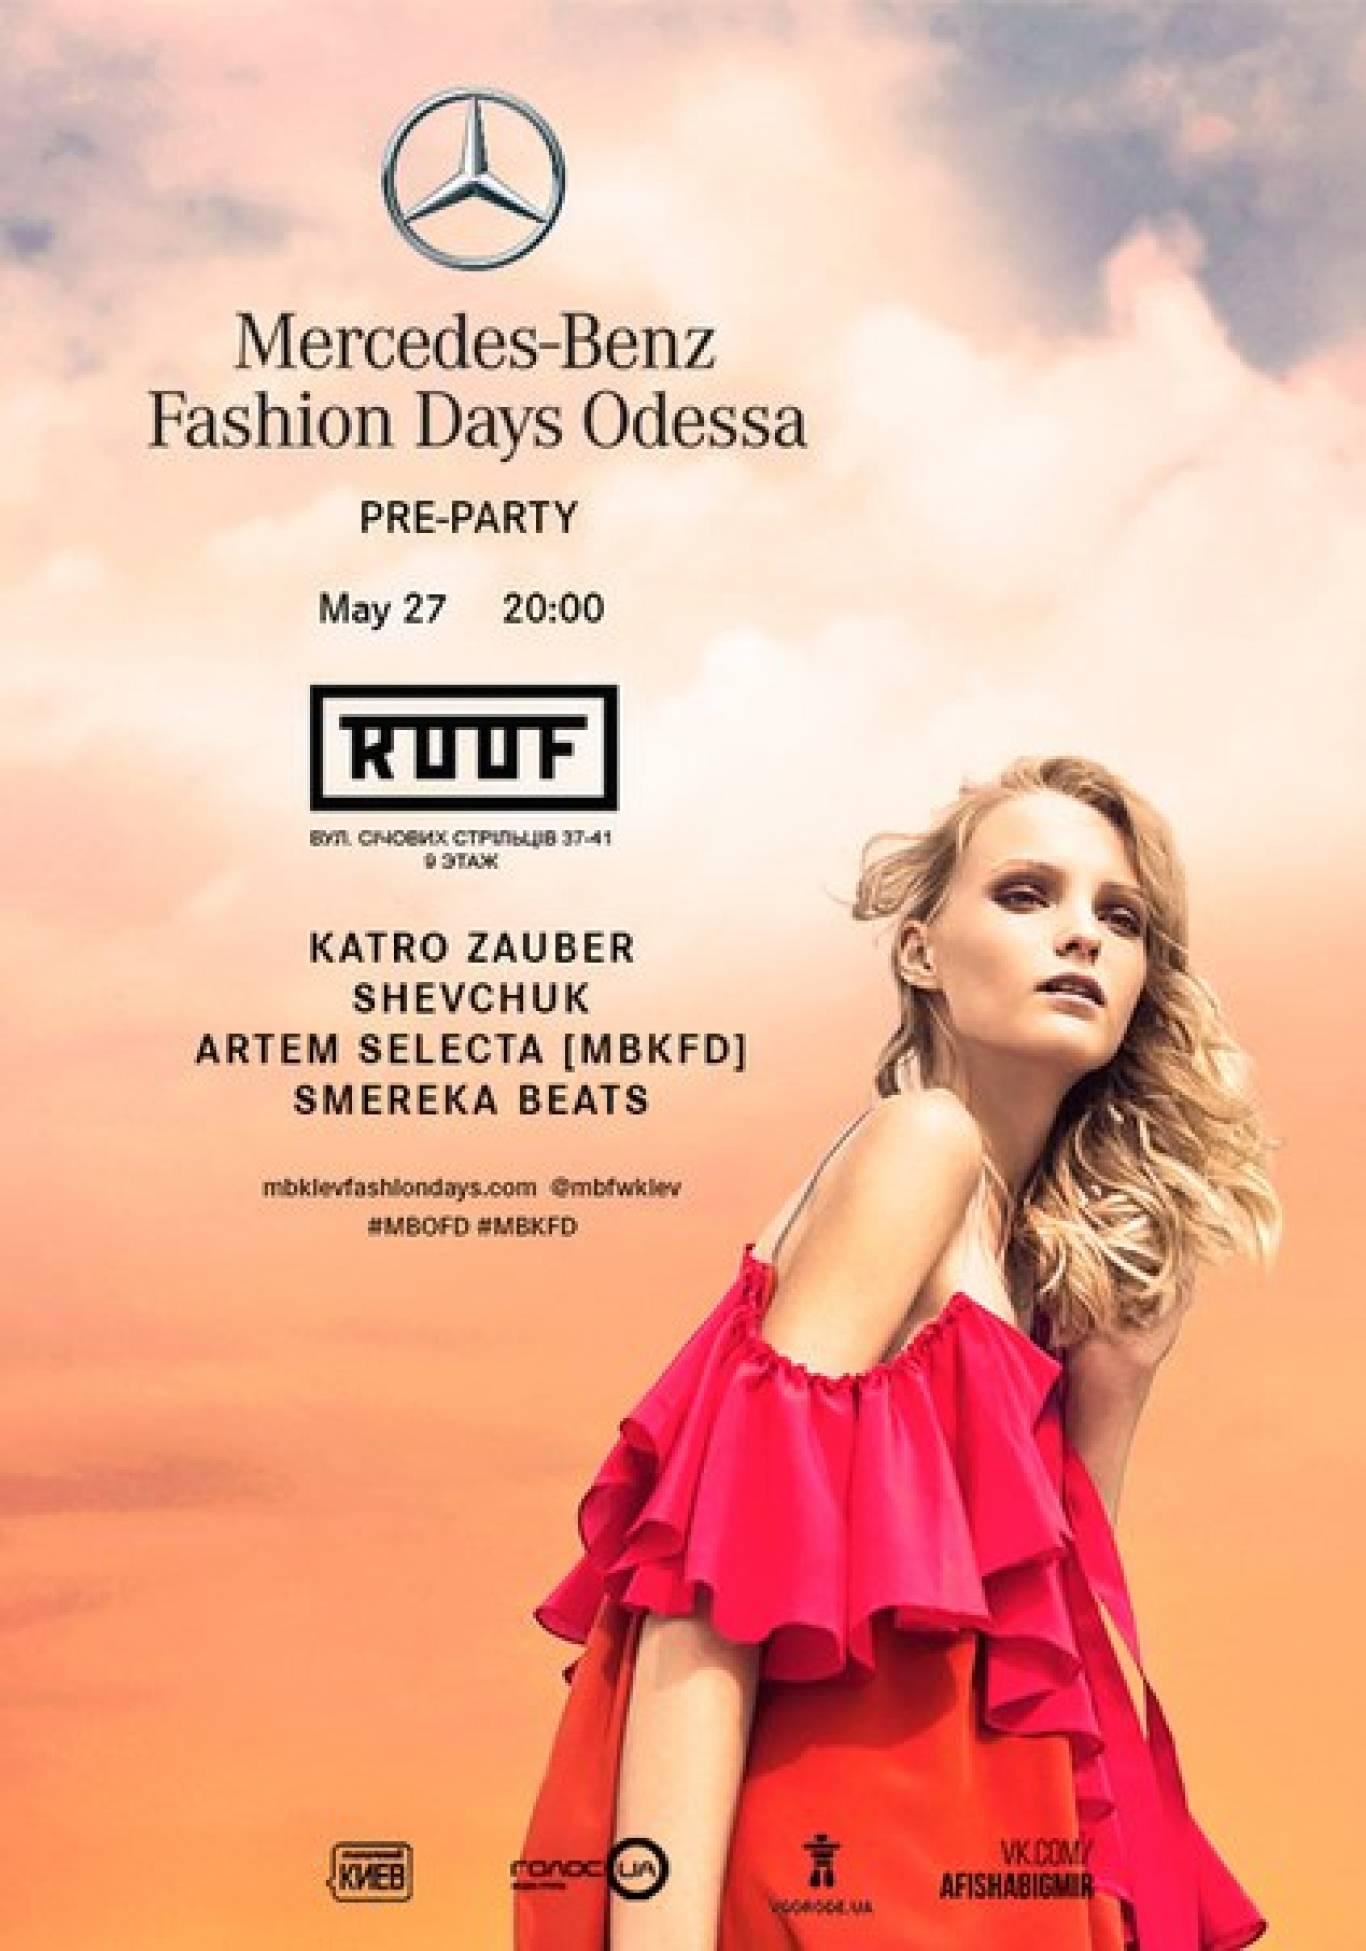 Mercedes-Benz Odessa Fashion Days PRE-PARTY